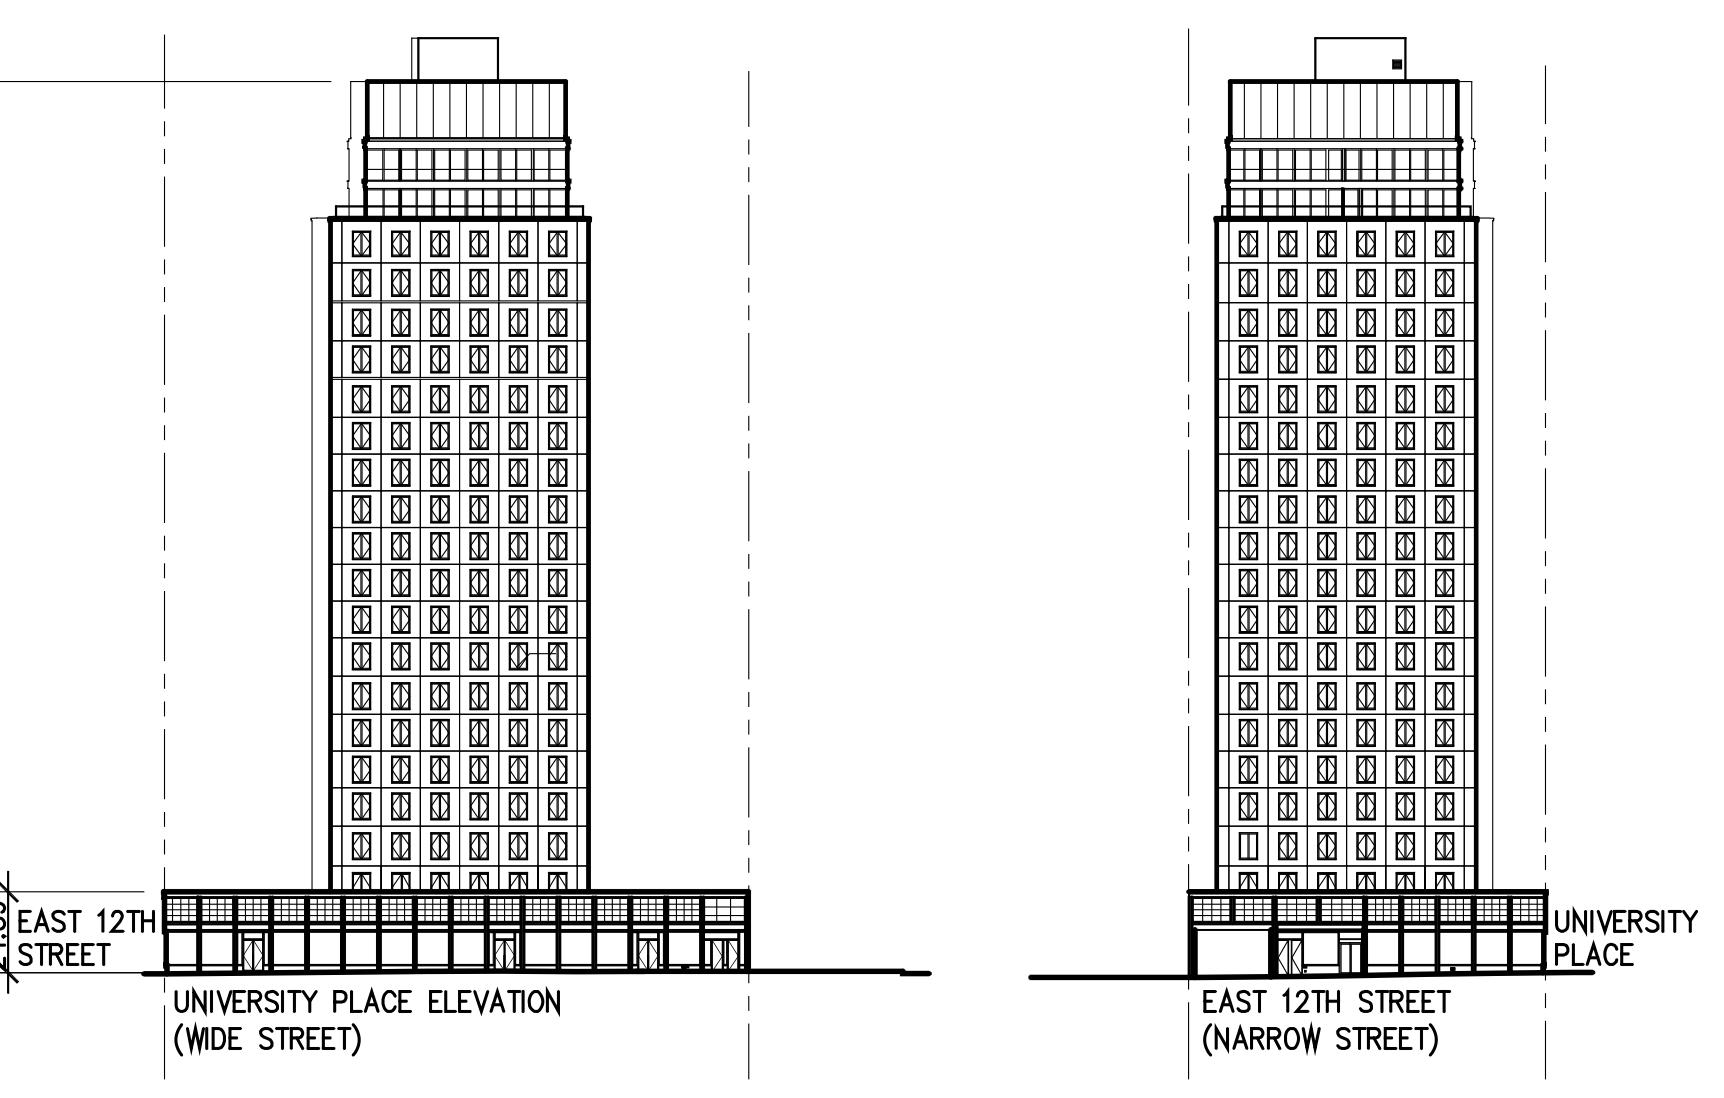 100 University Place